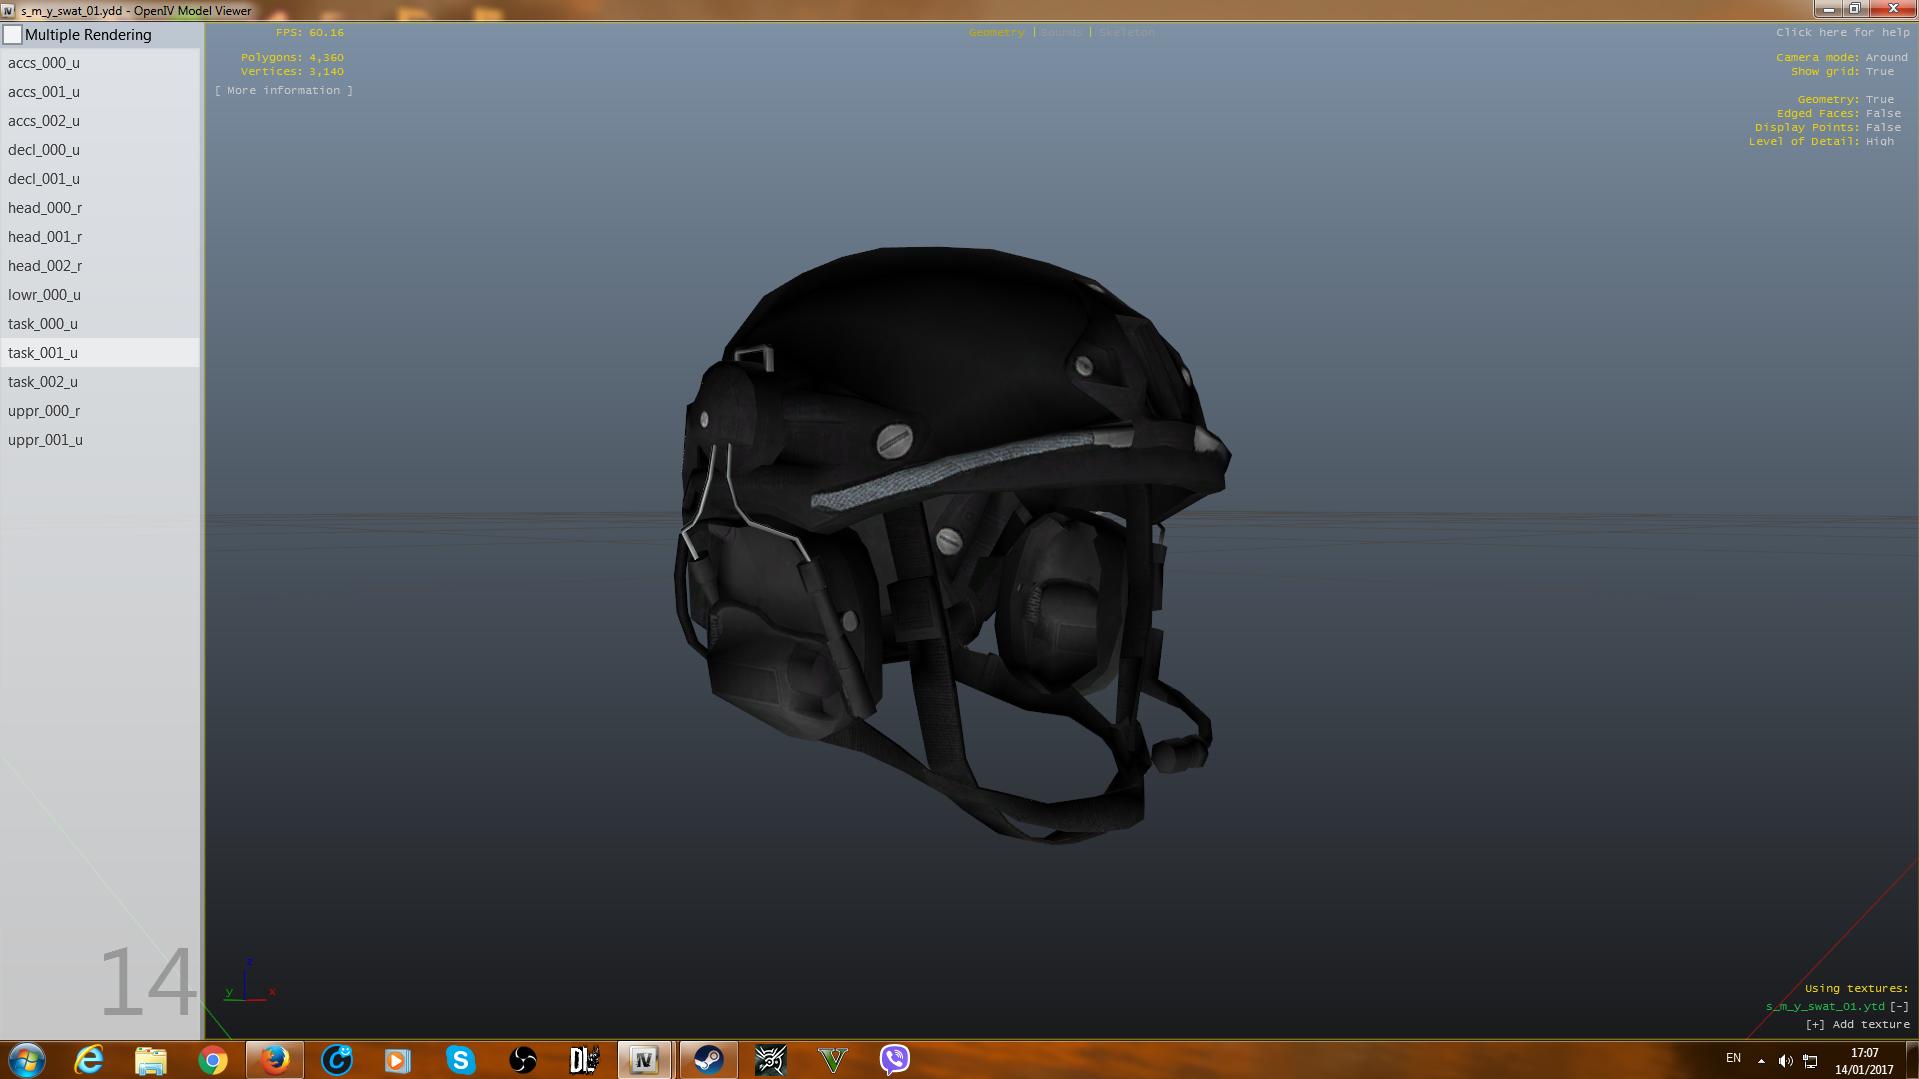 0_1484406508173_Helmet.PNG